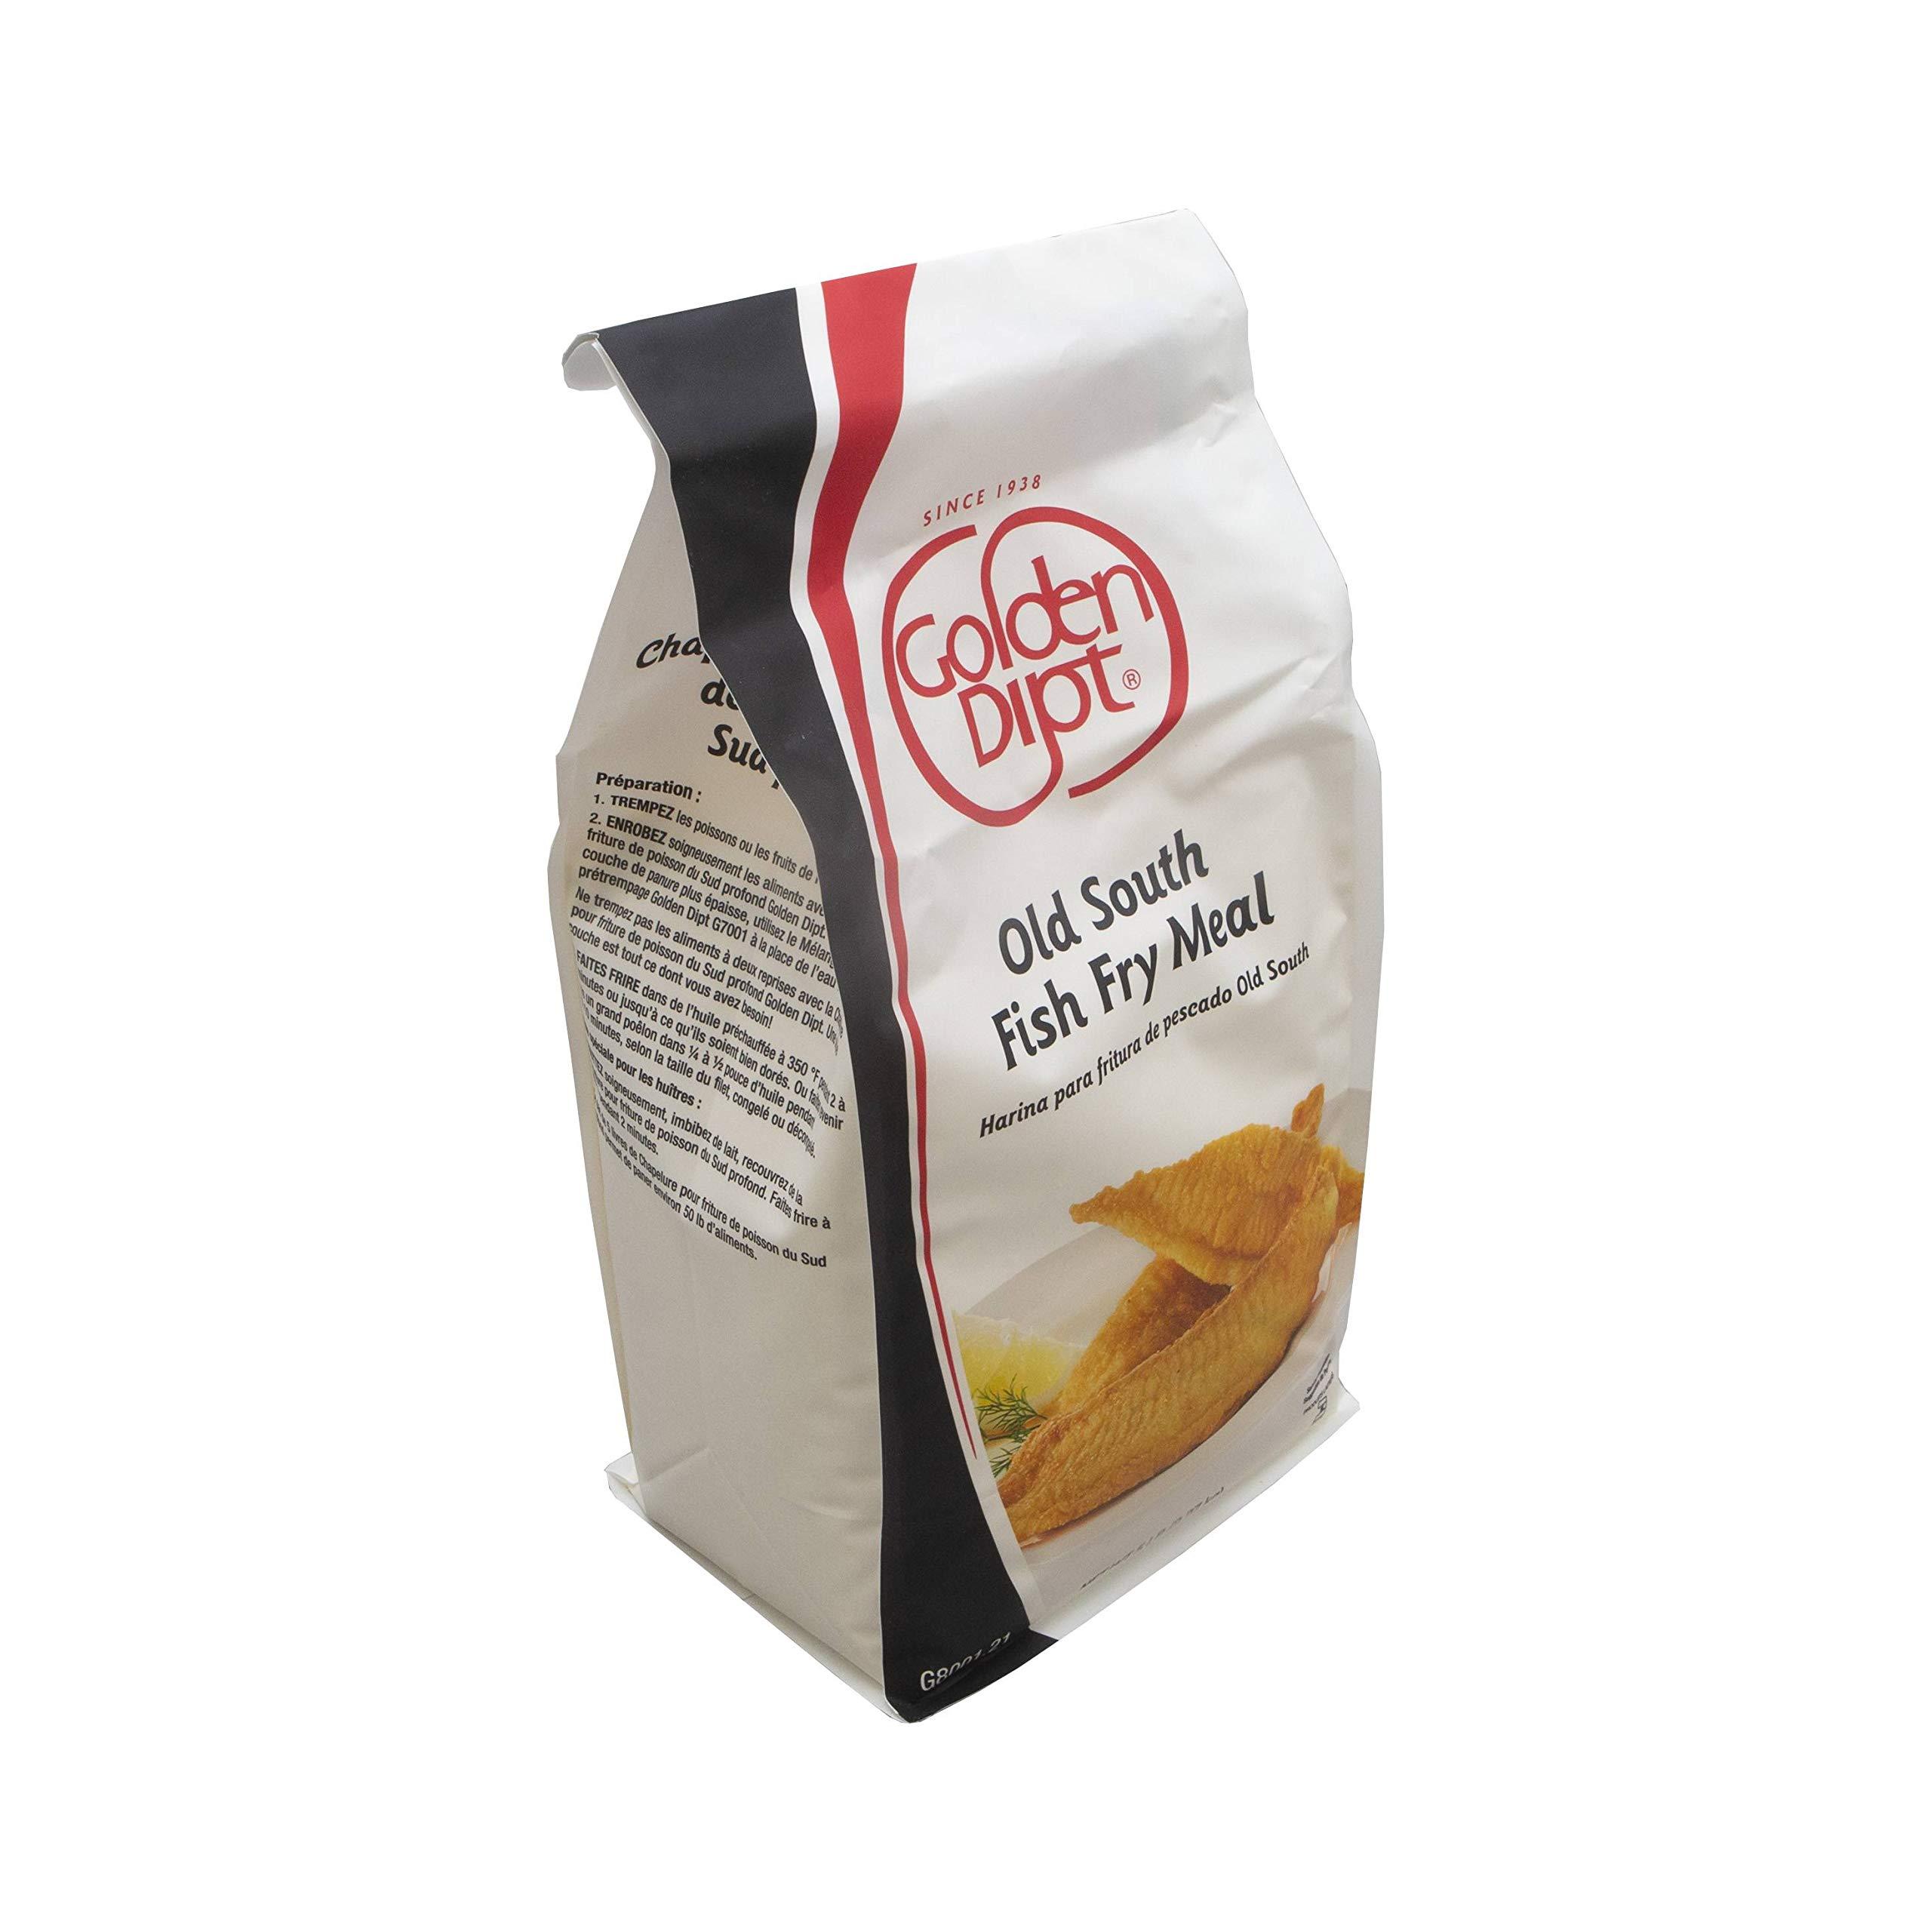 Golden Dipt Old South Fish Fry Mix, 5 Pound - 6 per case. by Golden Dipt (Image #1)